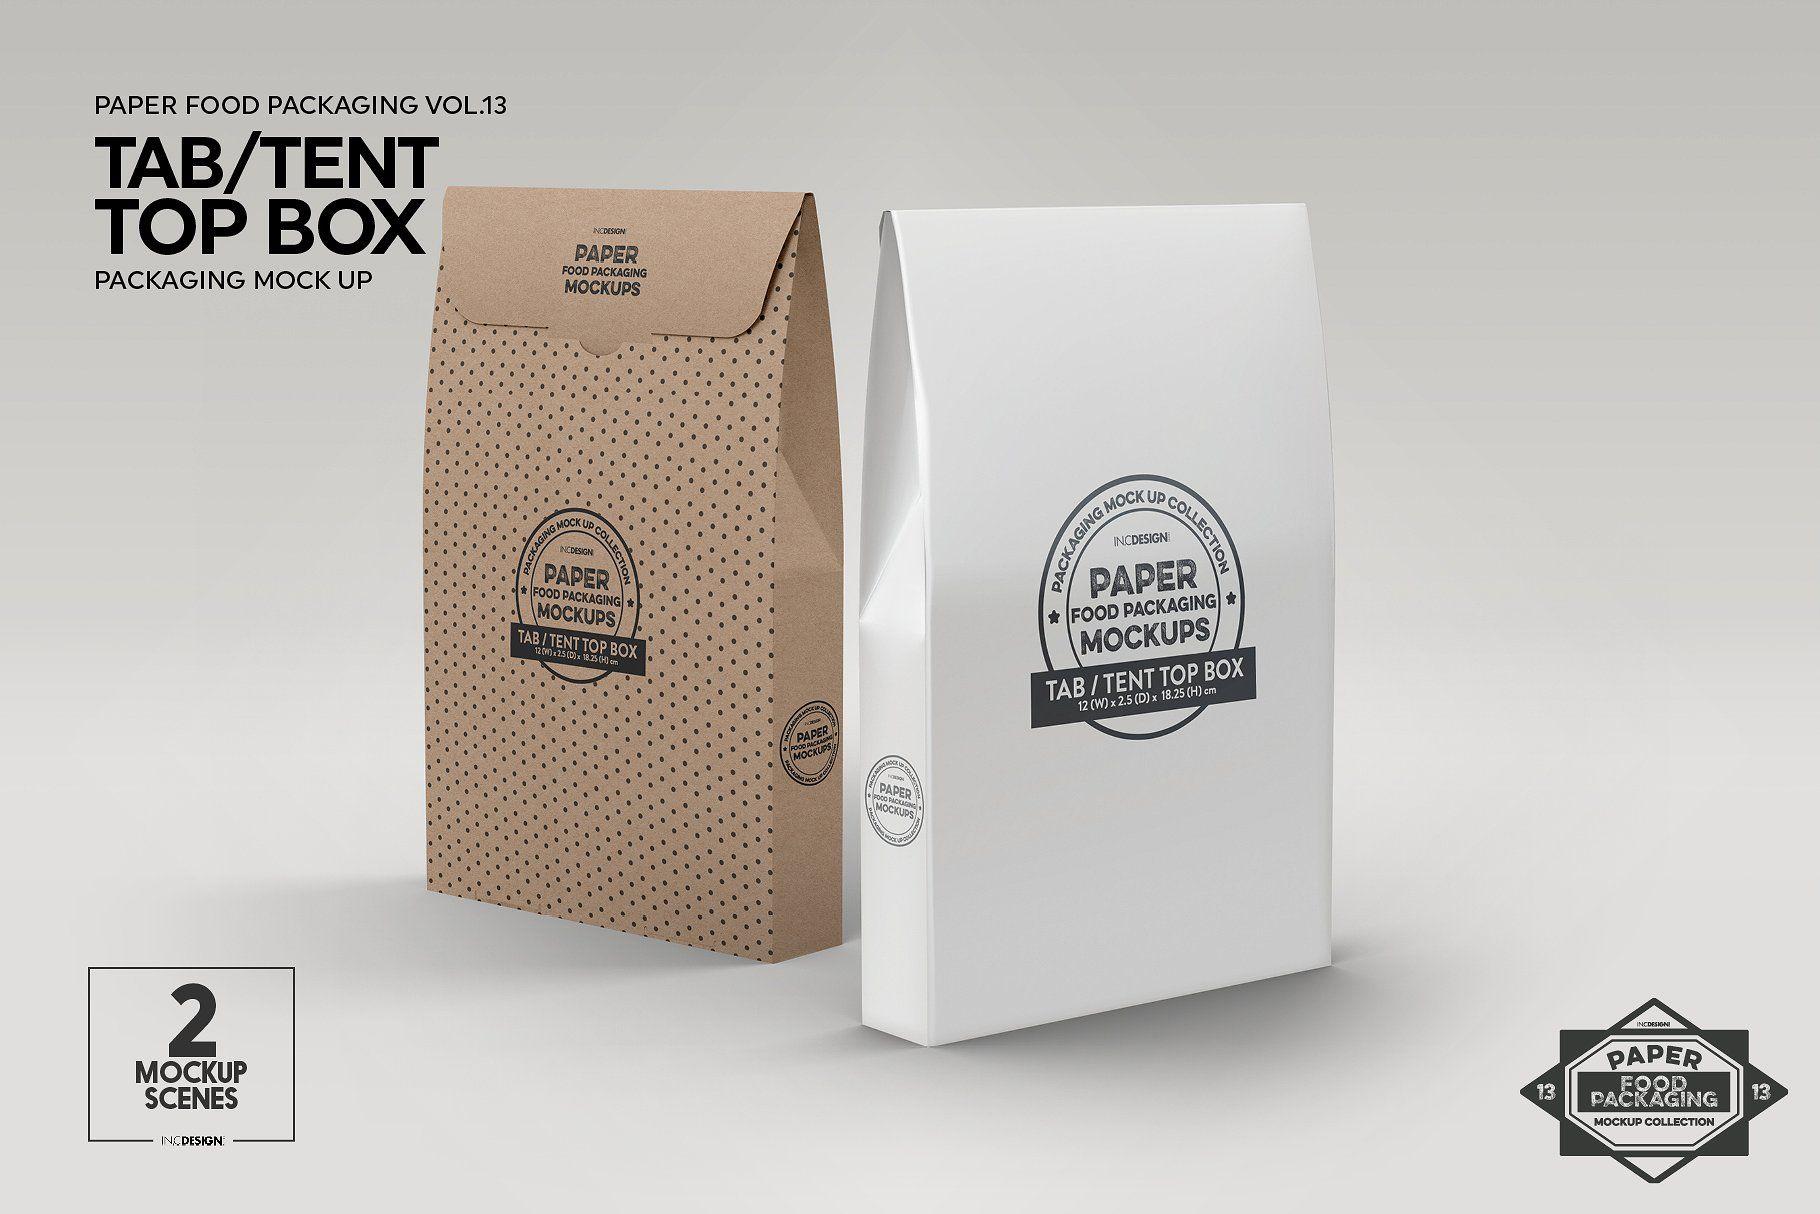 Download Tab Tent Top Box Packaging Mockup Packaging Mockup Free Packaging Mockup Box Packaging